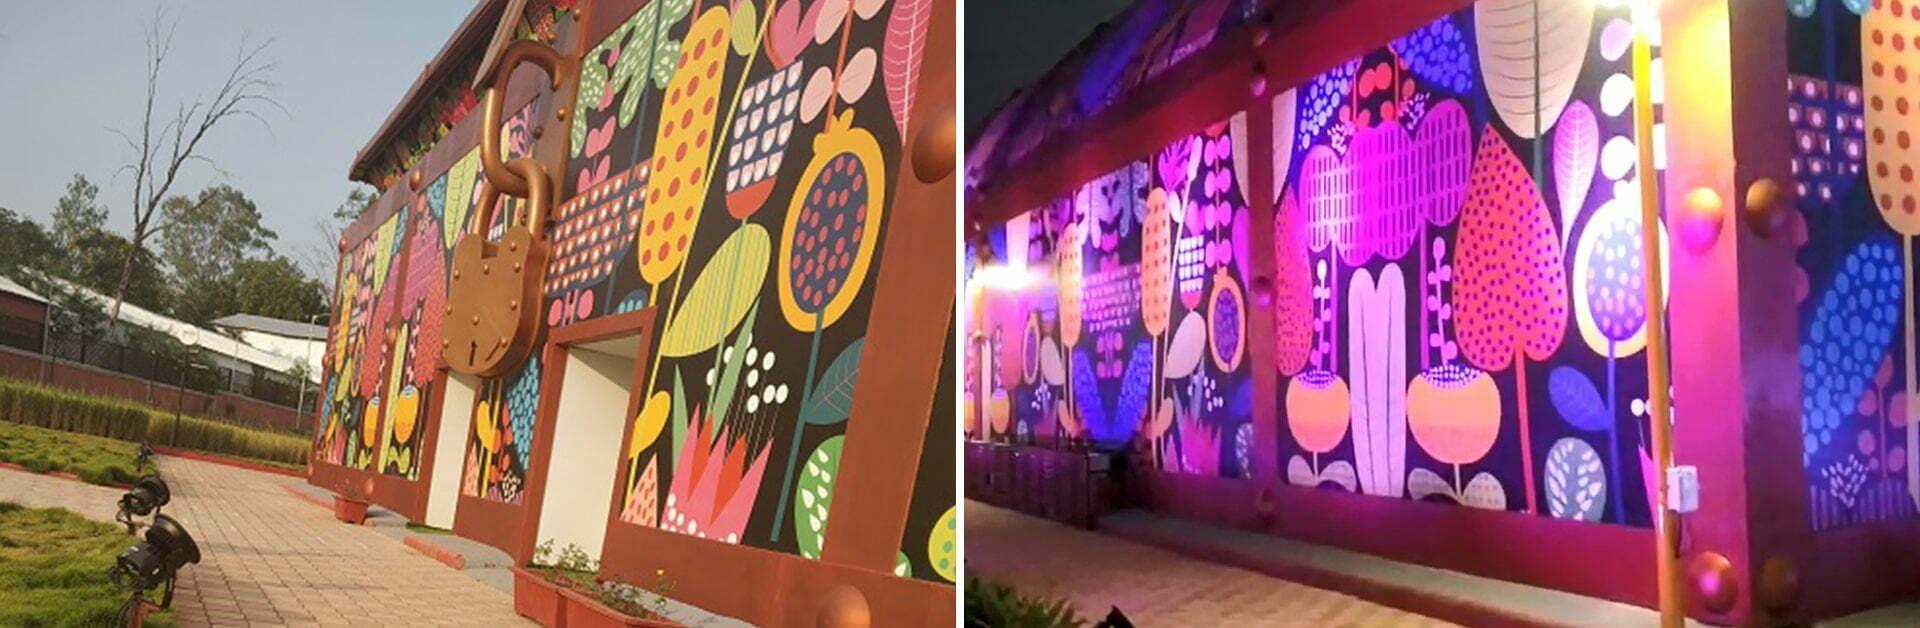 Banner 4 Children Nutrition Park, Kevadia Gujarat witnesses unforgettable luster from OSRAM LED PAR light